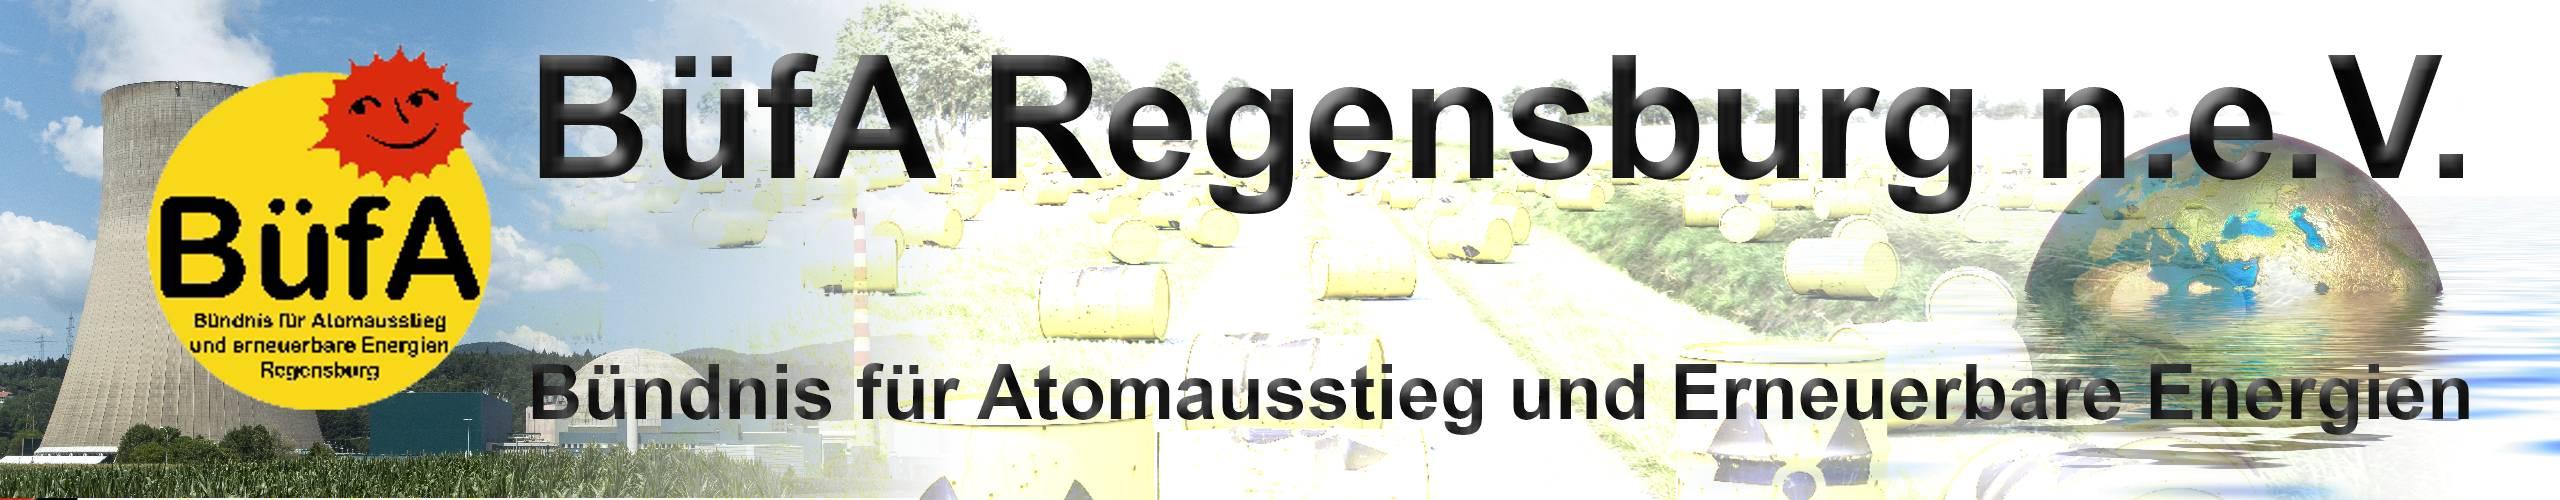 BüfA Regensburg